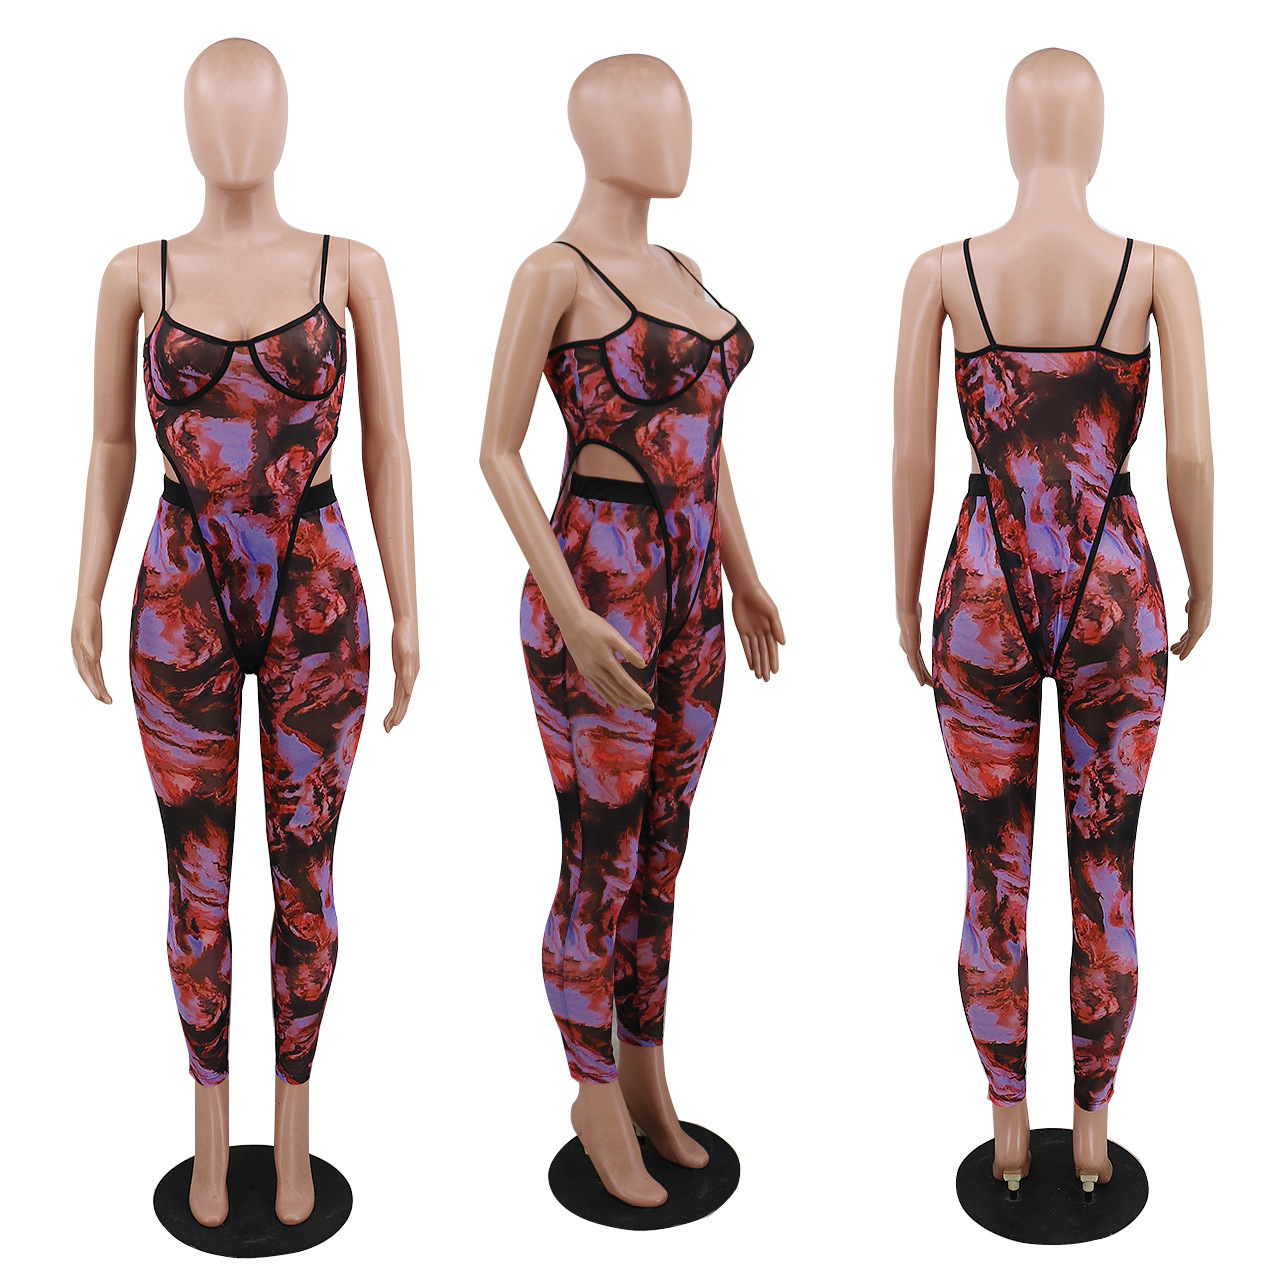 ANJAMANOR Fashion Print Sheer Mesh Pants Set Clubwear See Through Jumpsuit Women Two Piece Outfits Bodysuit Leggings D57-CD18 6